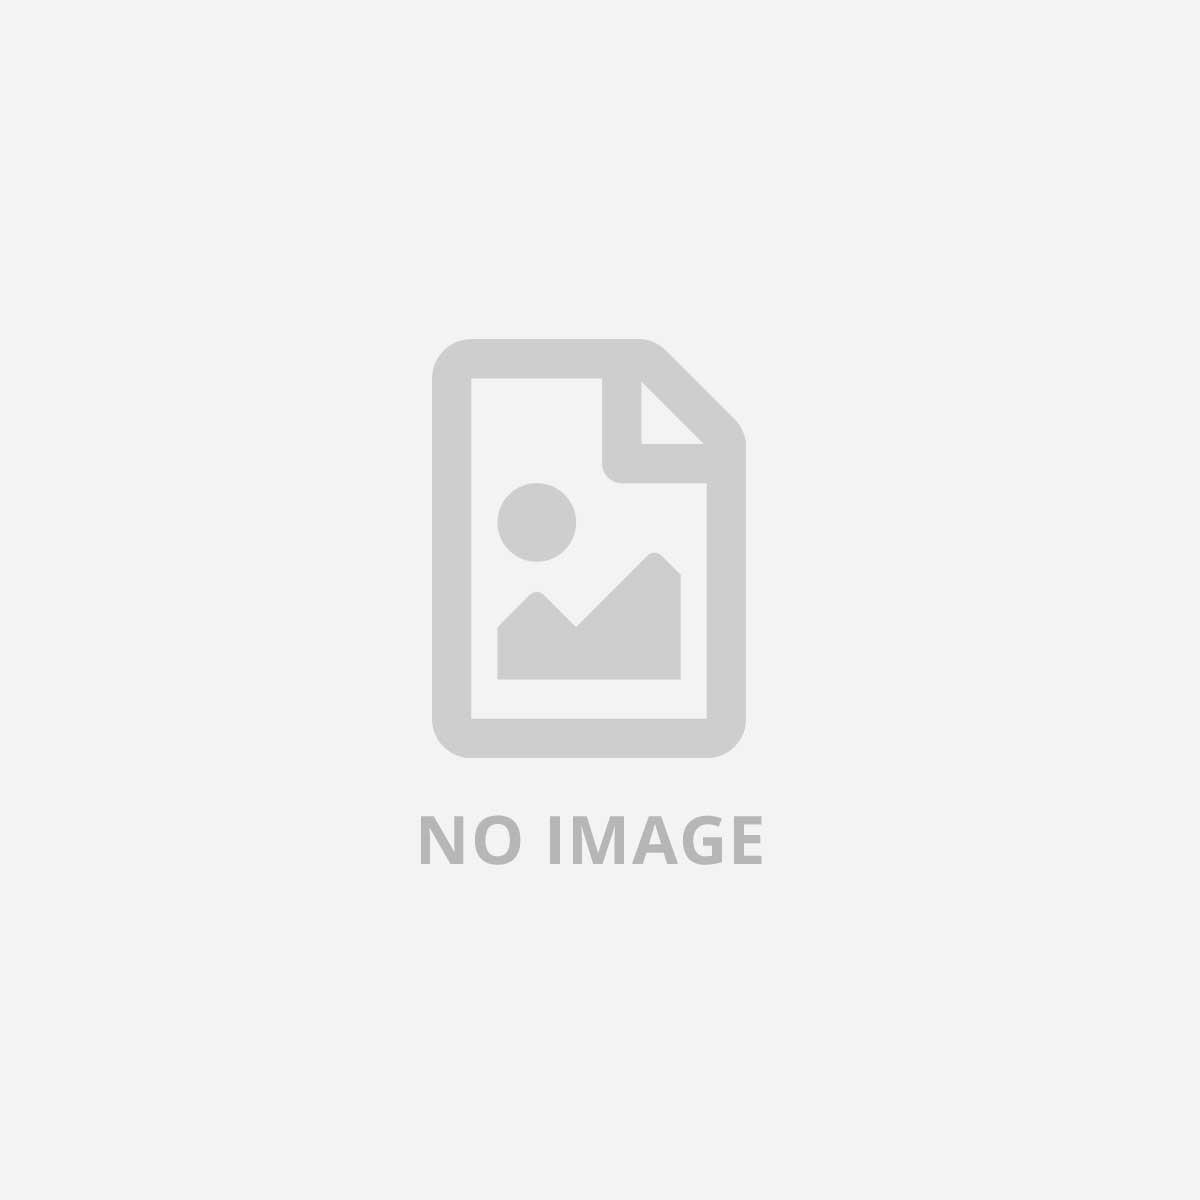 ANTEC A40-PRO